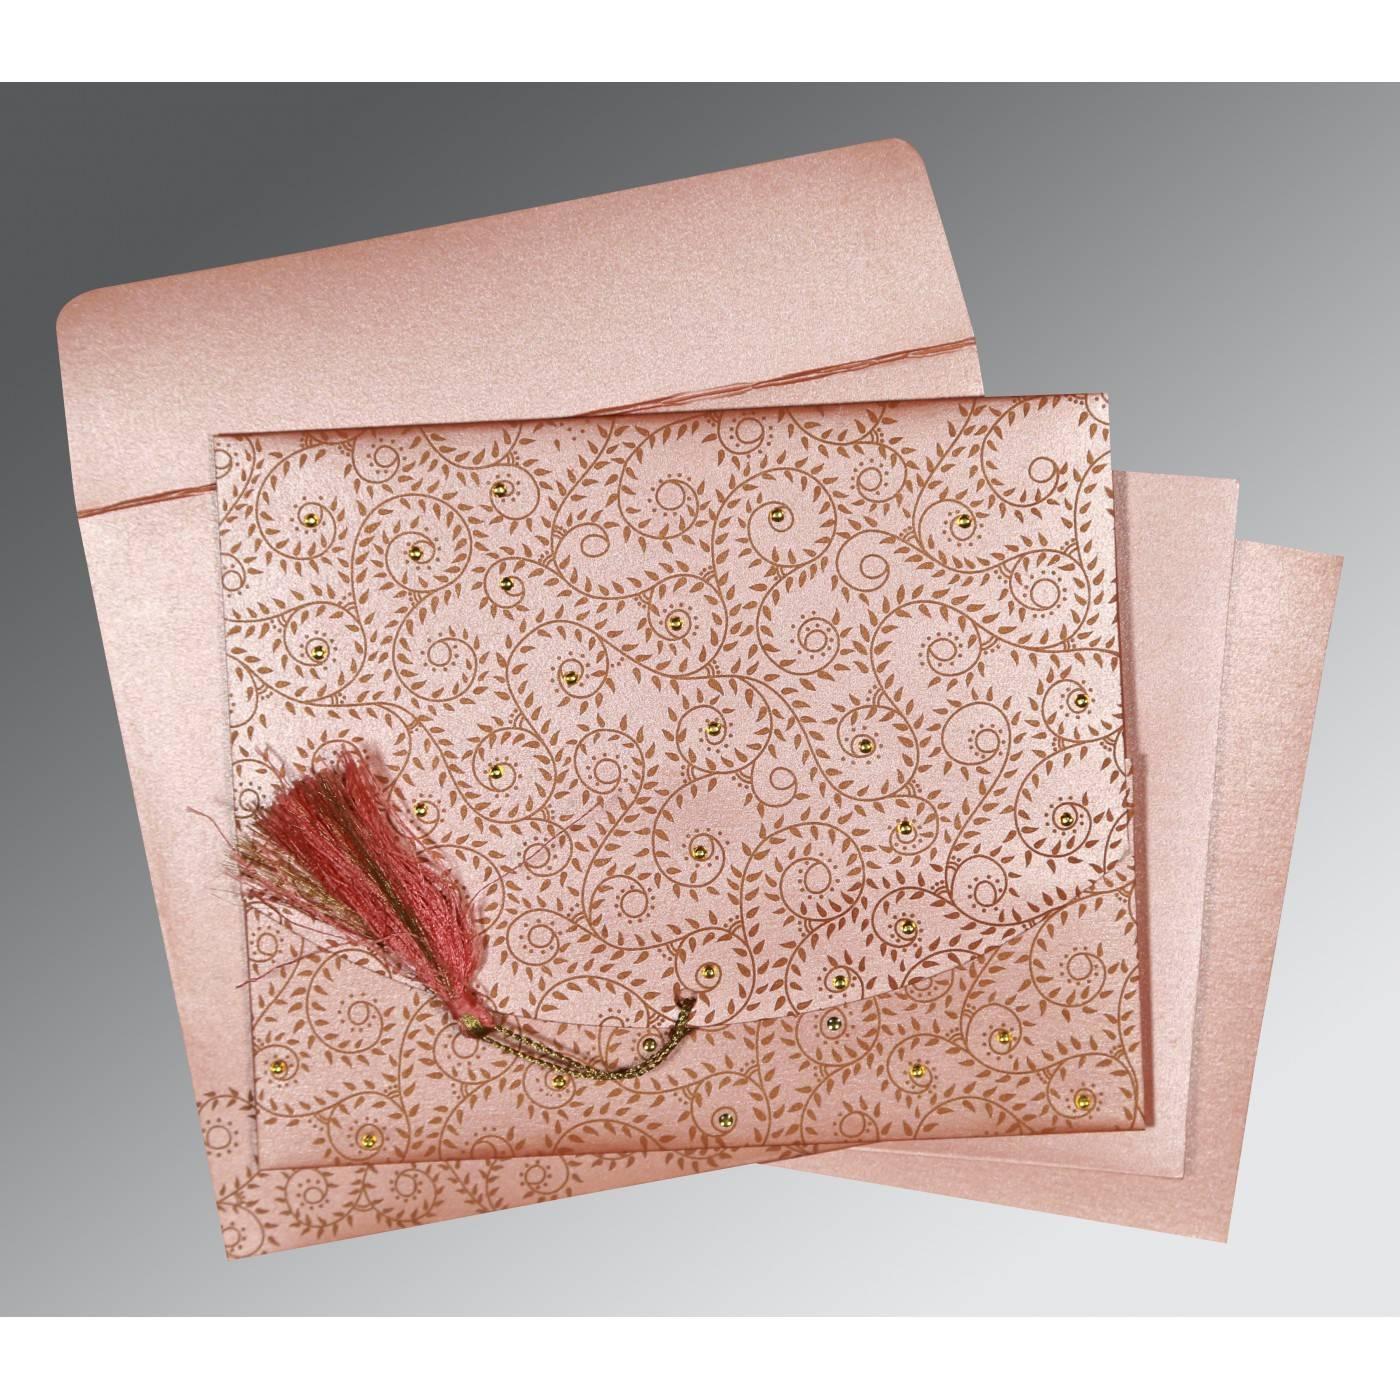 BABY PINK SHIMMERY SCREEN PRINTED WEDDING INVITATION : CRU-8217N - IndianWeddingCards